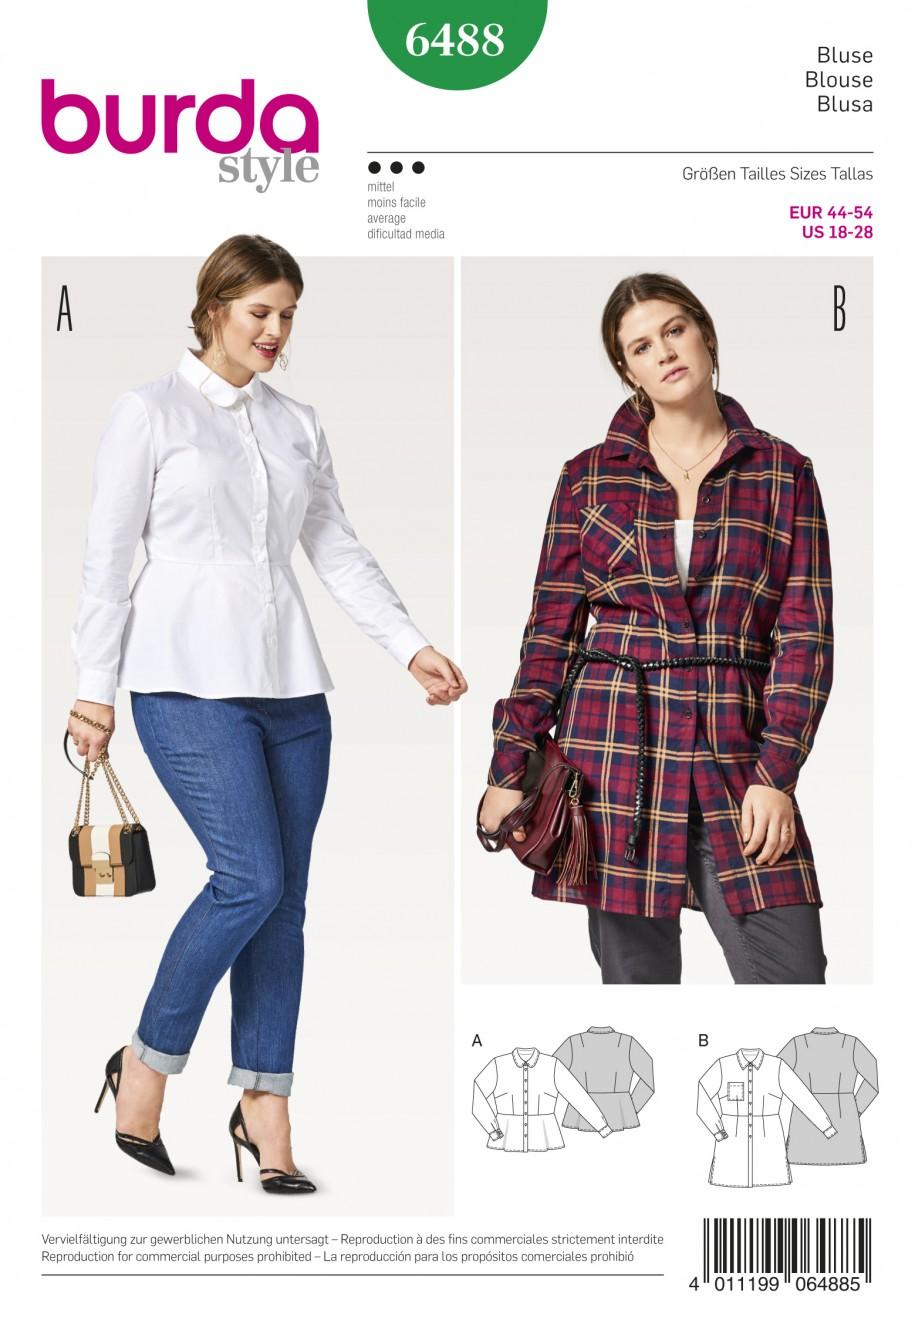 Burda Style Sewing Pattern - 6488 - Plus Size Blouses | Sewing ...